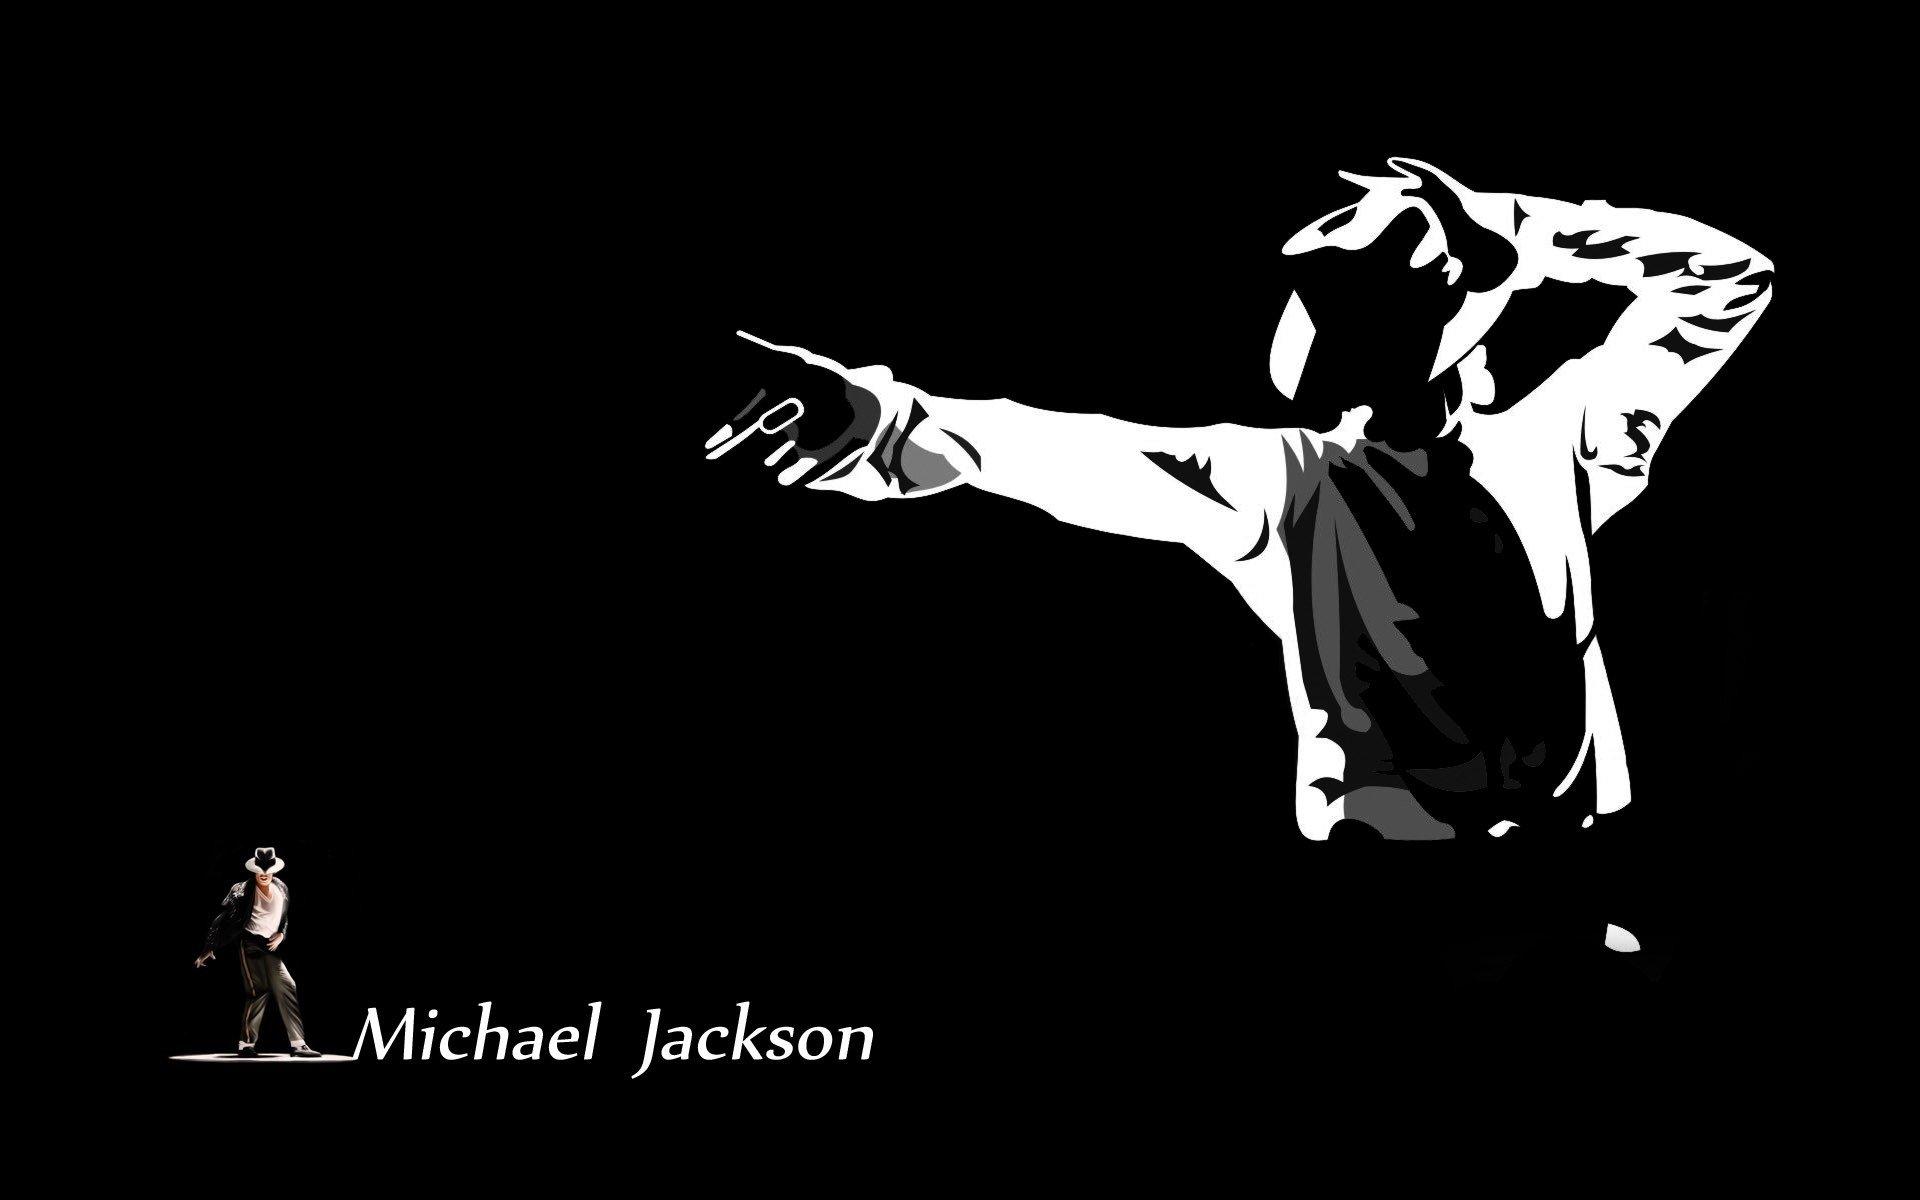 Michael Jackson Hd Wallpaper Background Image 1920x1200 Id